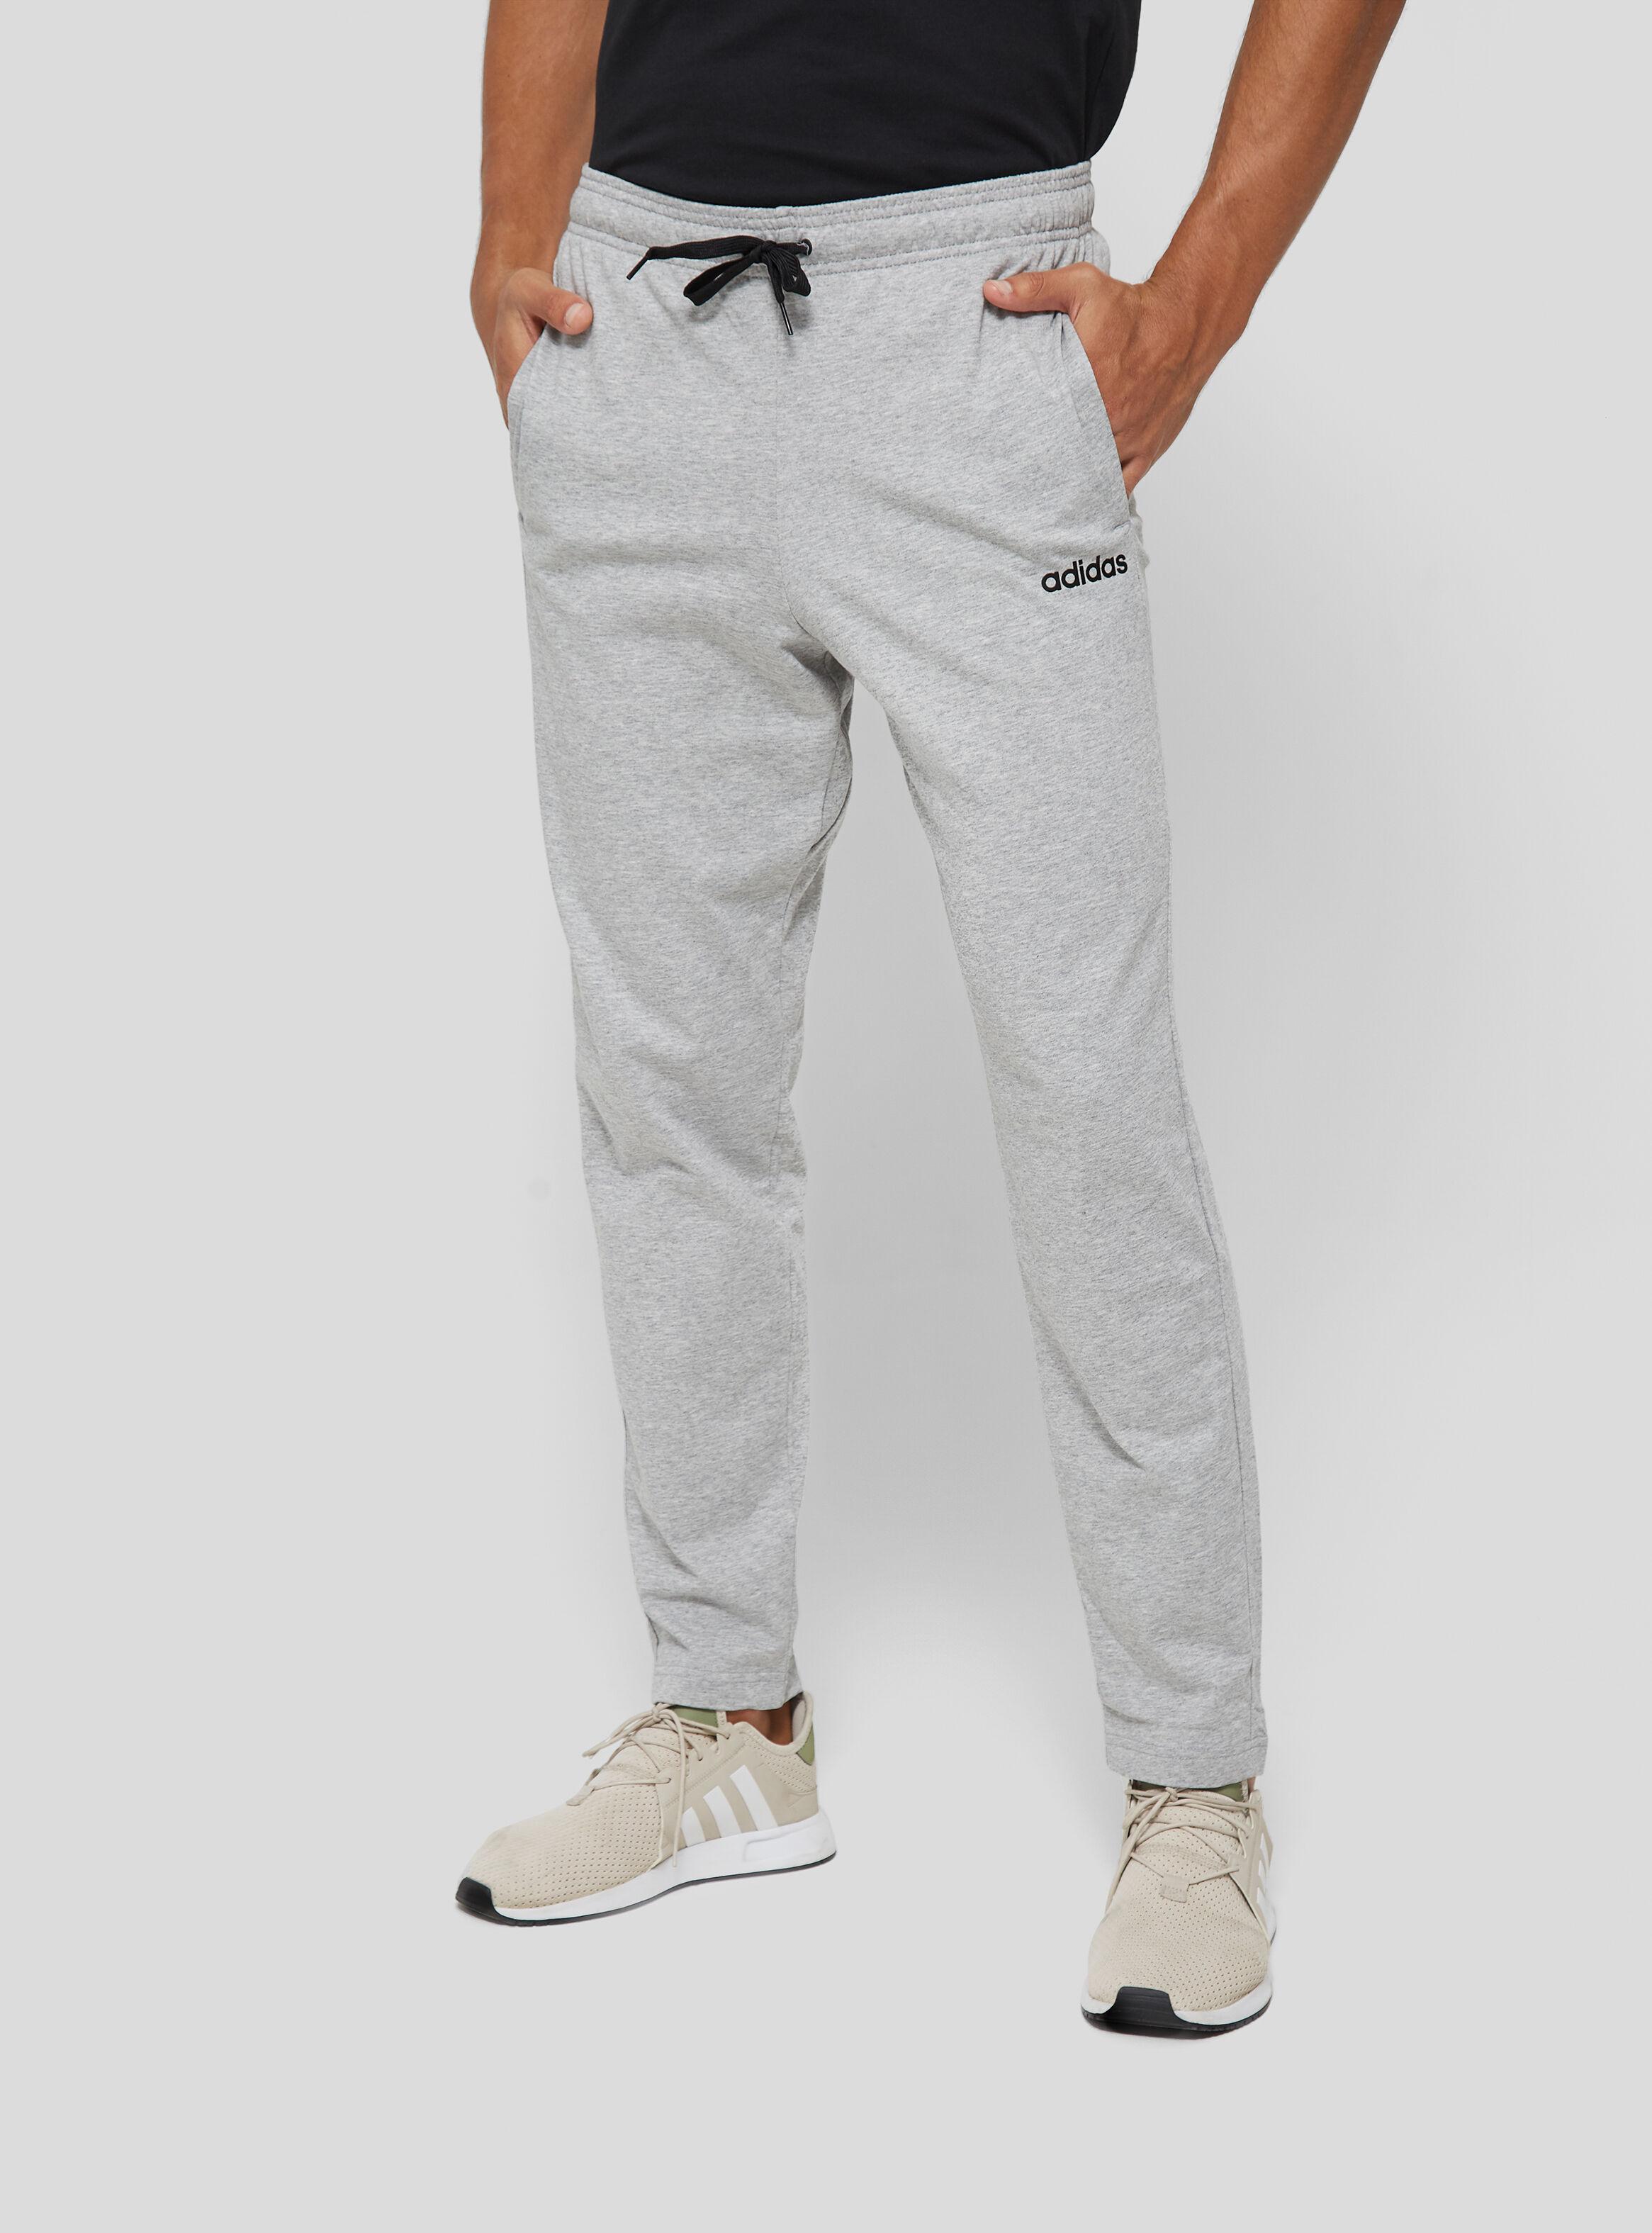 8a282ed66f08b Paris Essentials Adidas Pantalón Hombre Plain Tapered Buzo HYWWgpwqa